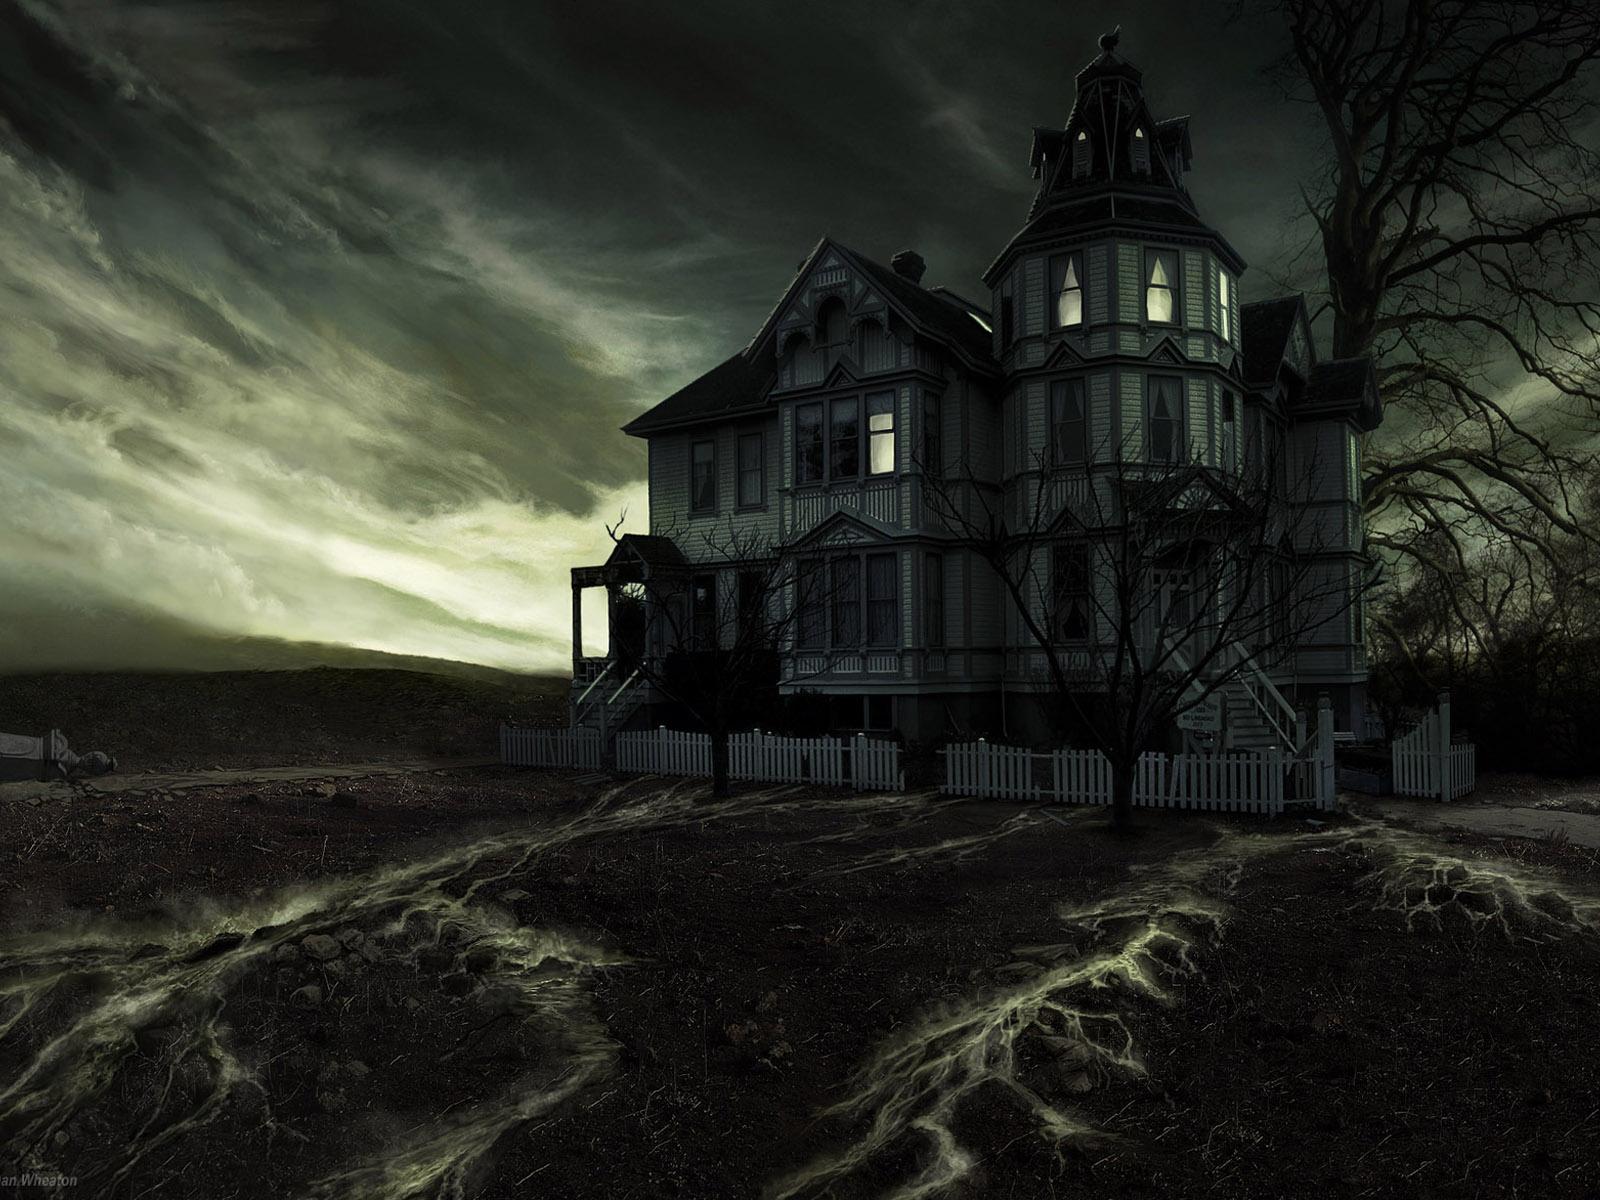 Dark House Art Concept